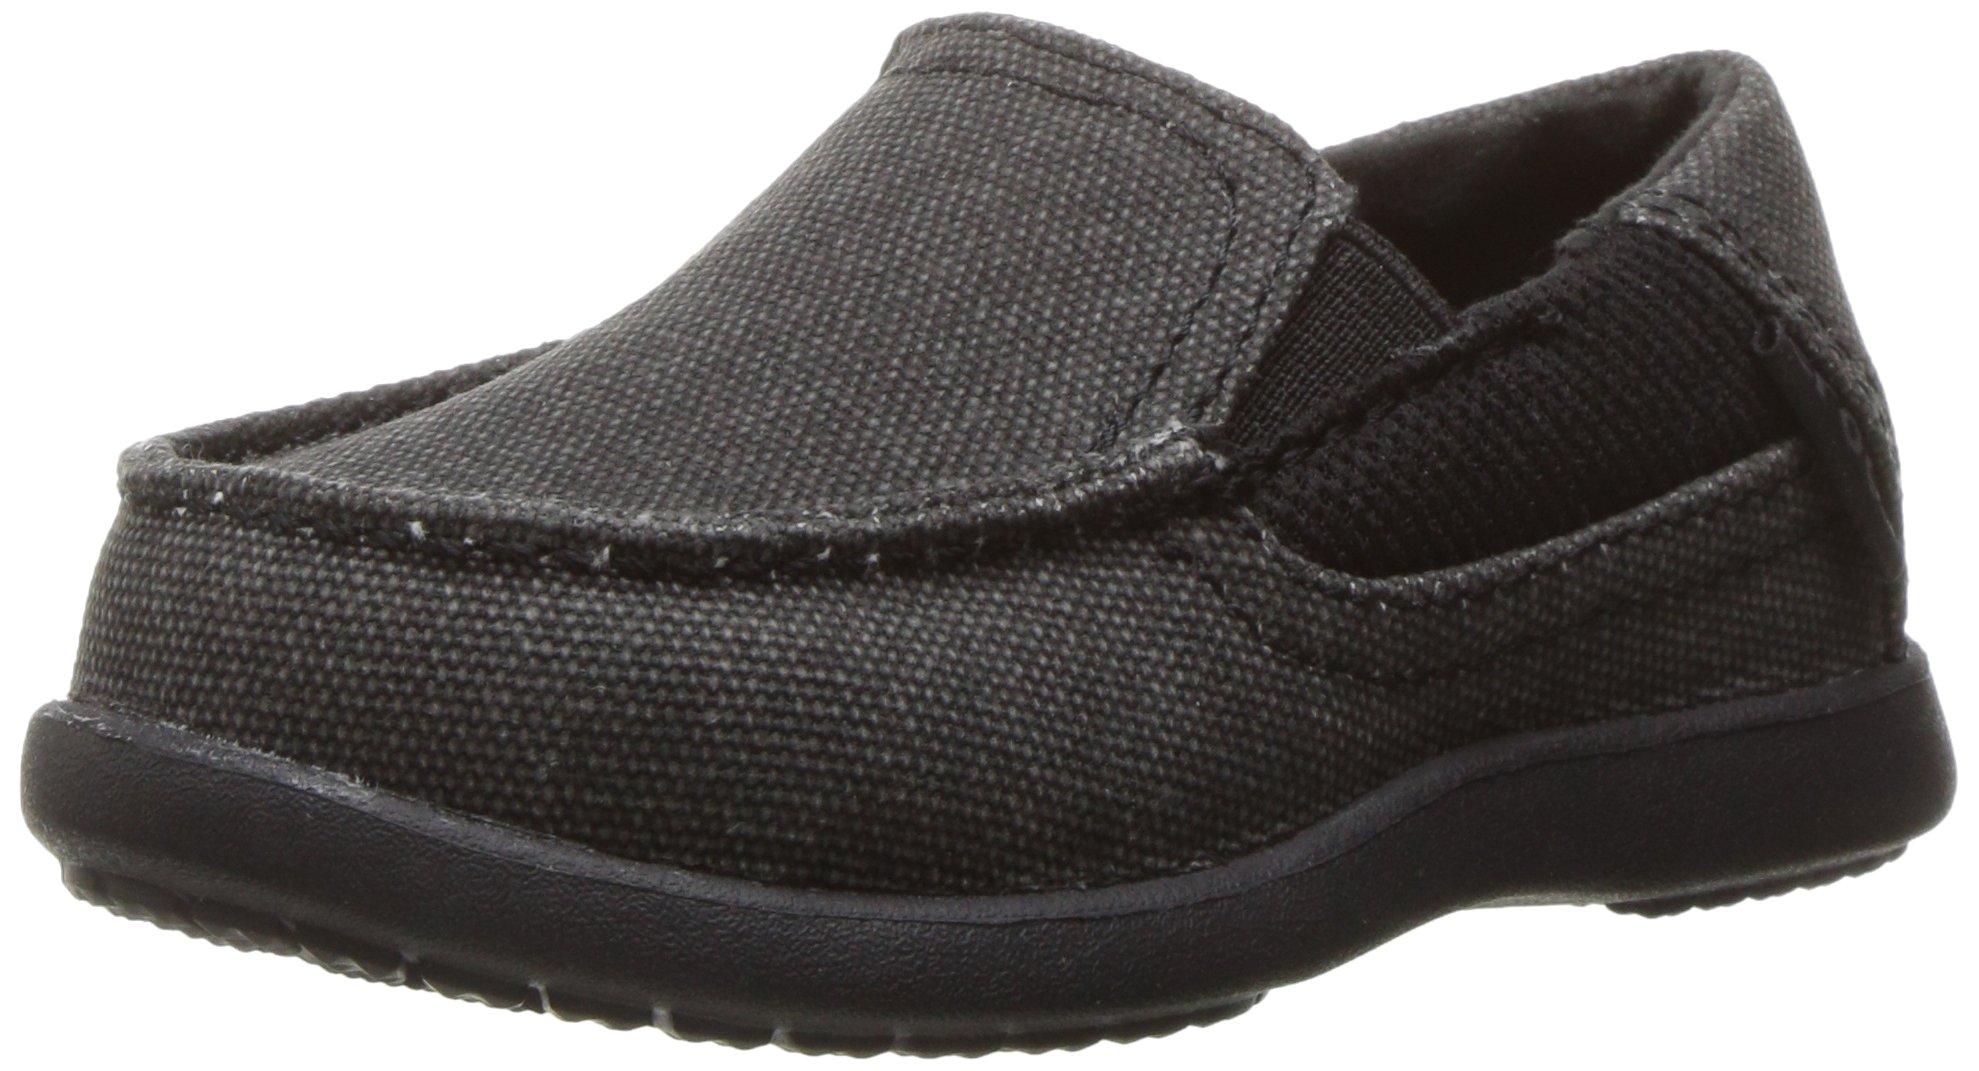 crocs Boys' Santa Cruz II PS Loafer, Black/Black, 10 M US Toddler